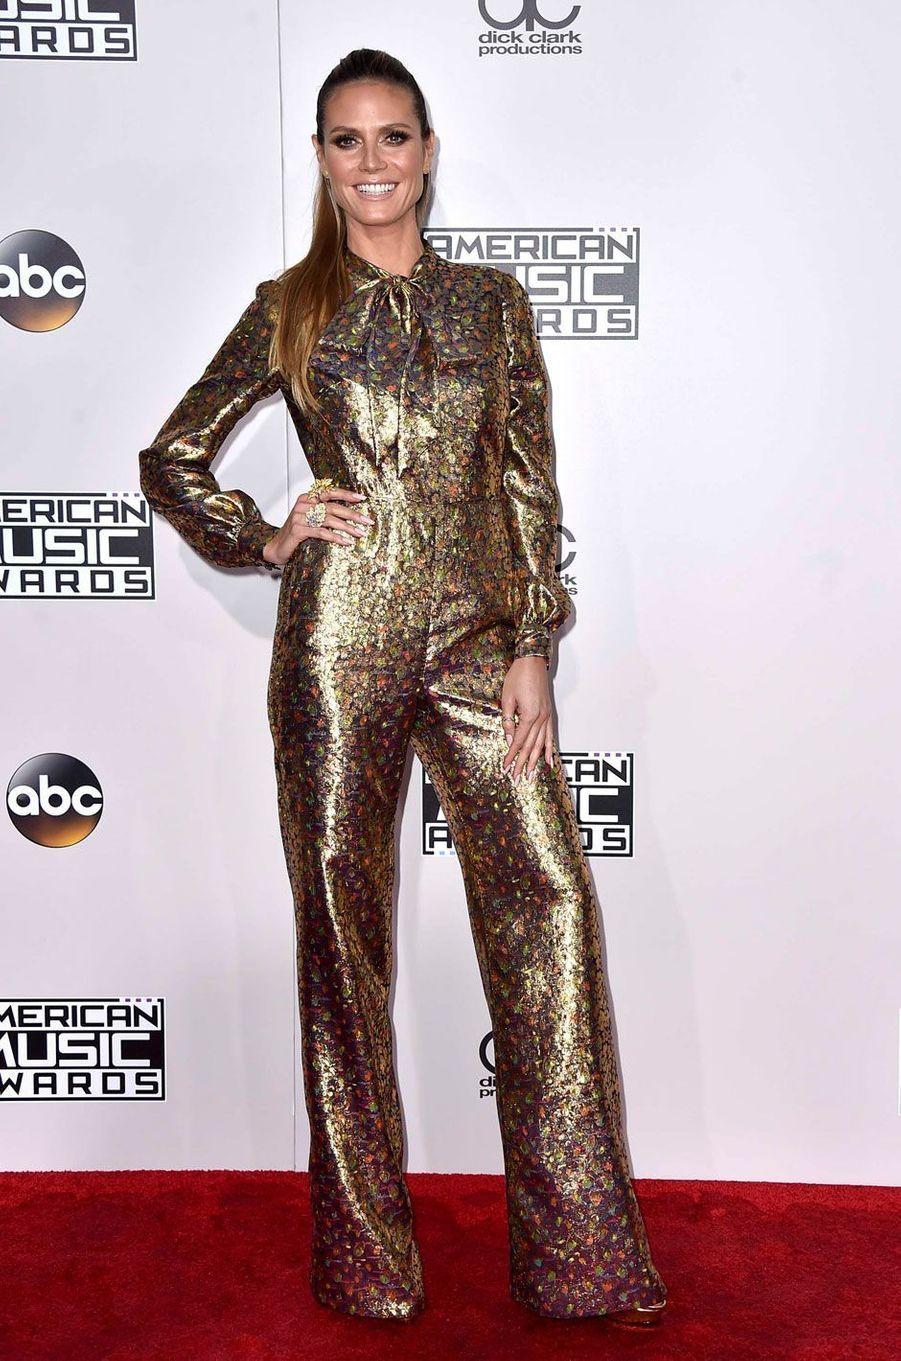 Heidi Klumaux American Music Awards